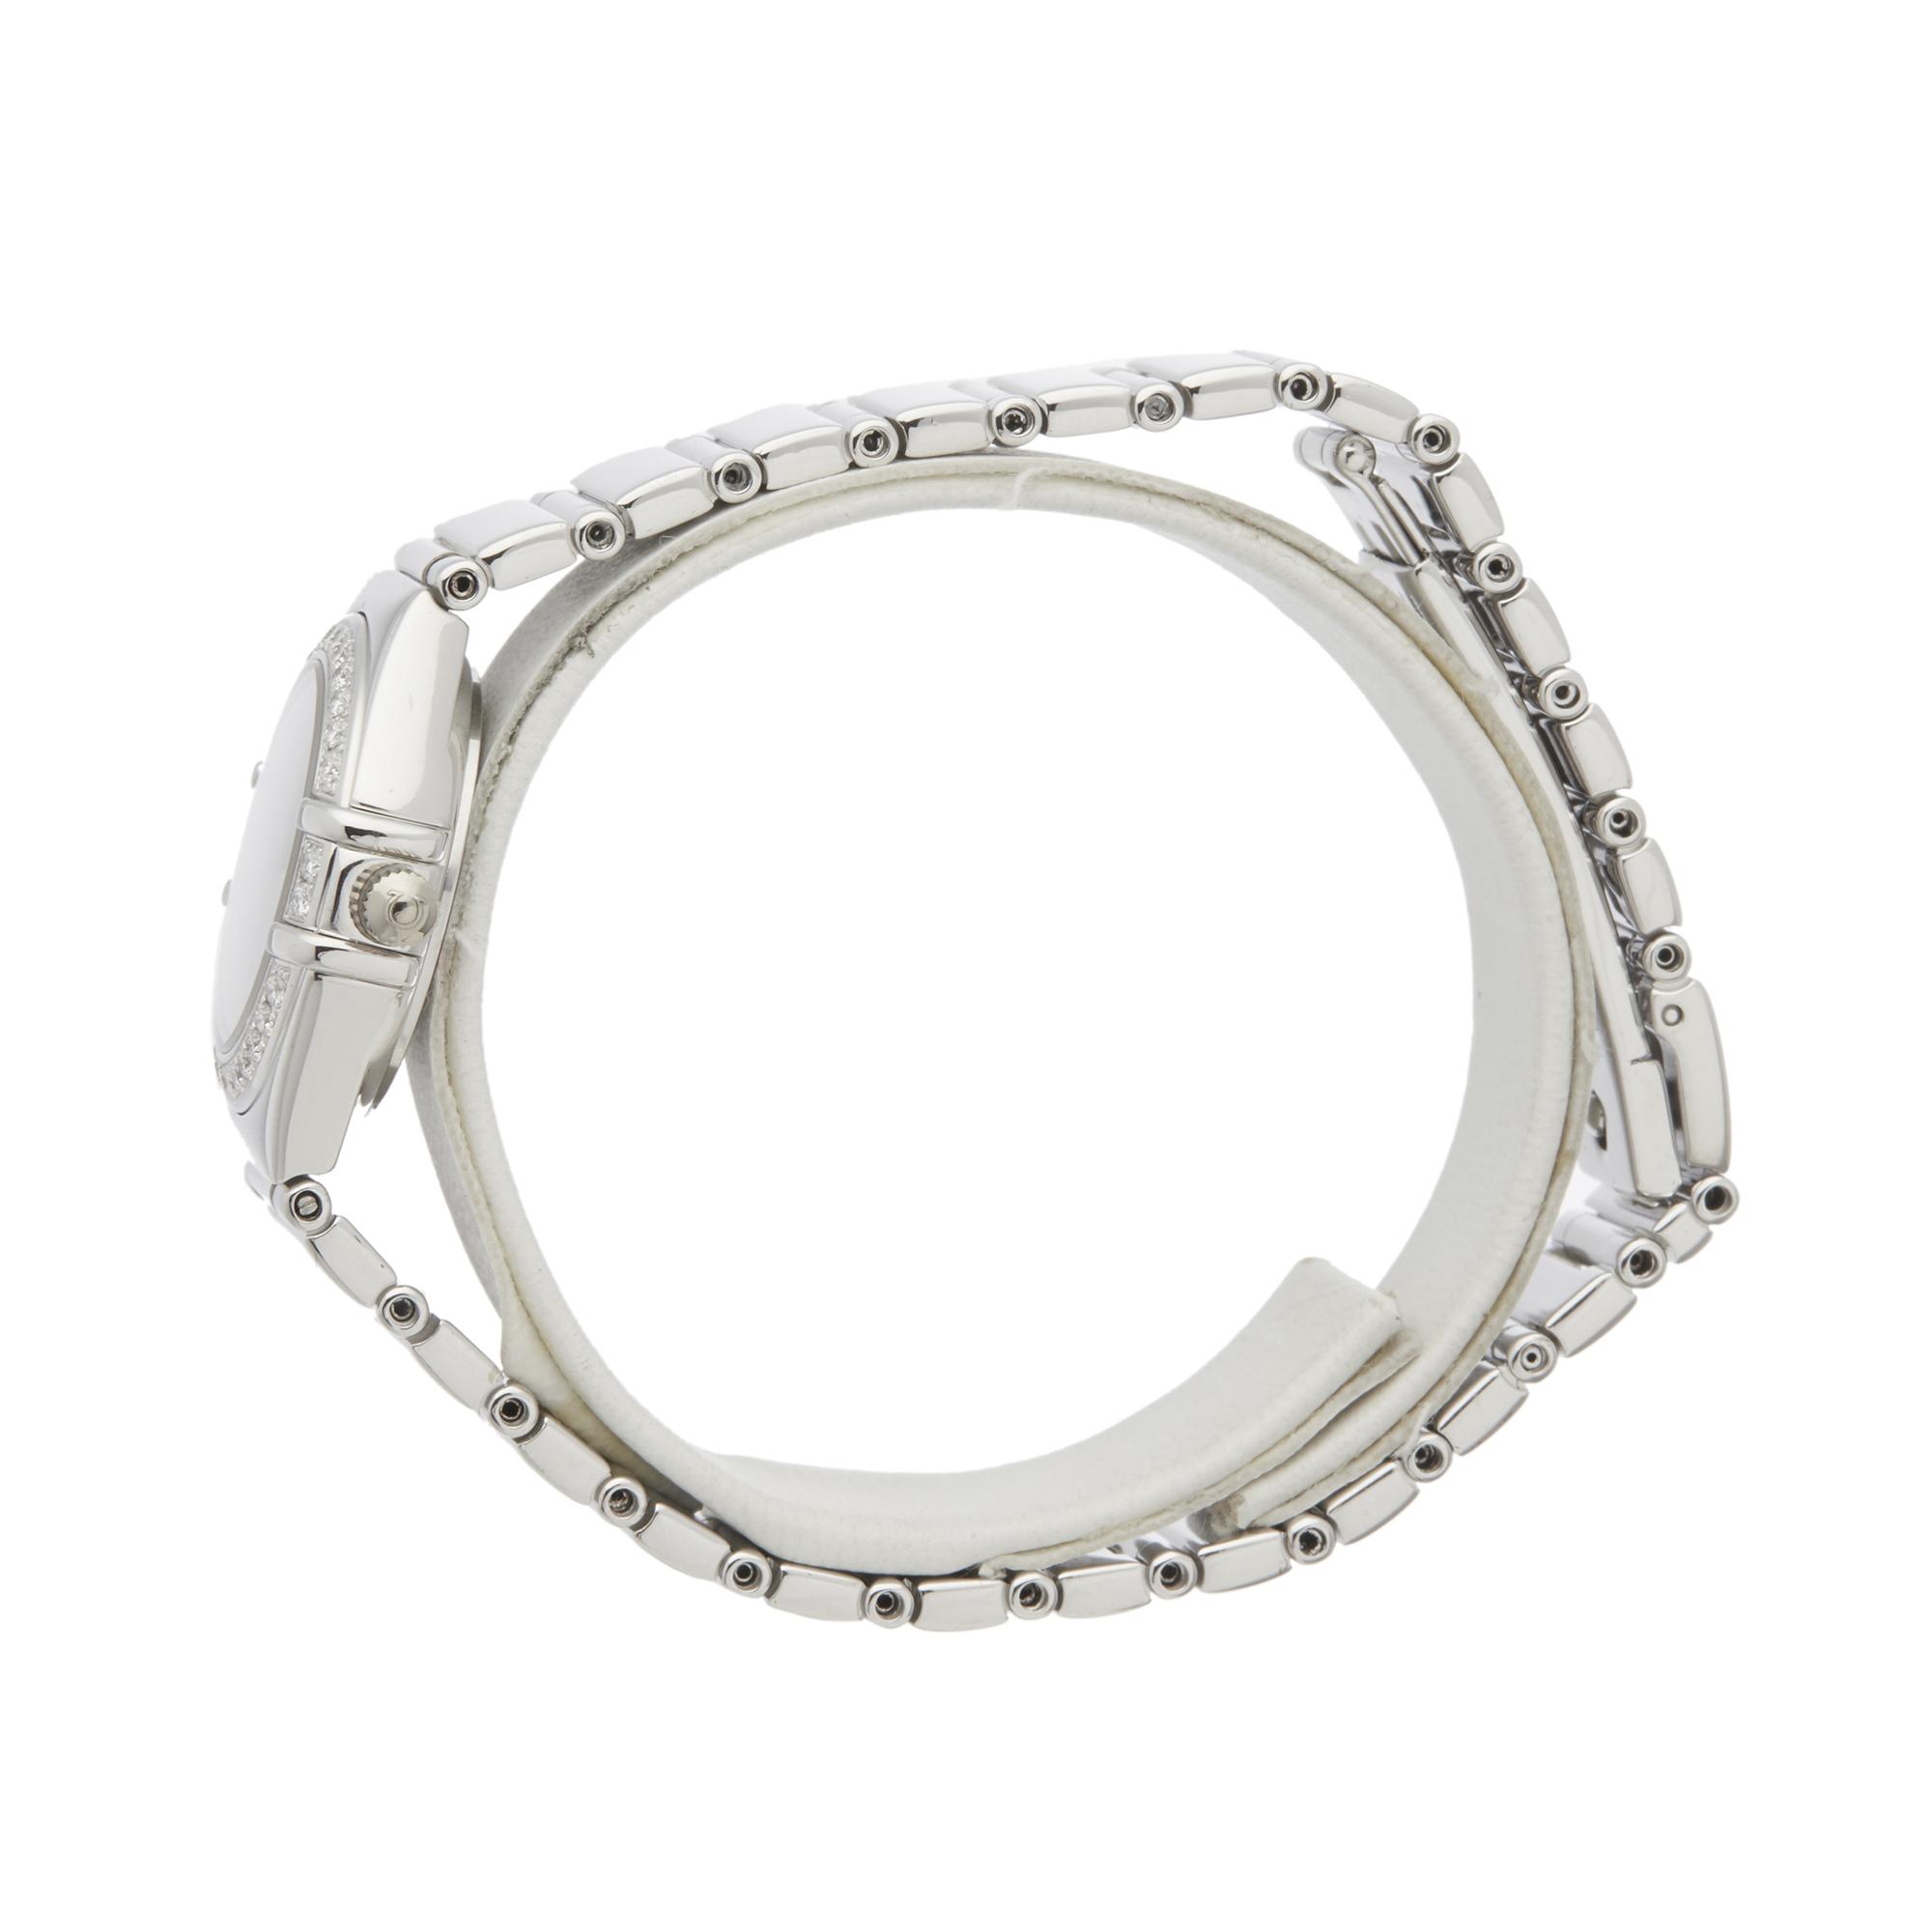 Omega Constellation 0 1165.36 Ladies White Gold Diamond Watch - Image 6 of 7